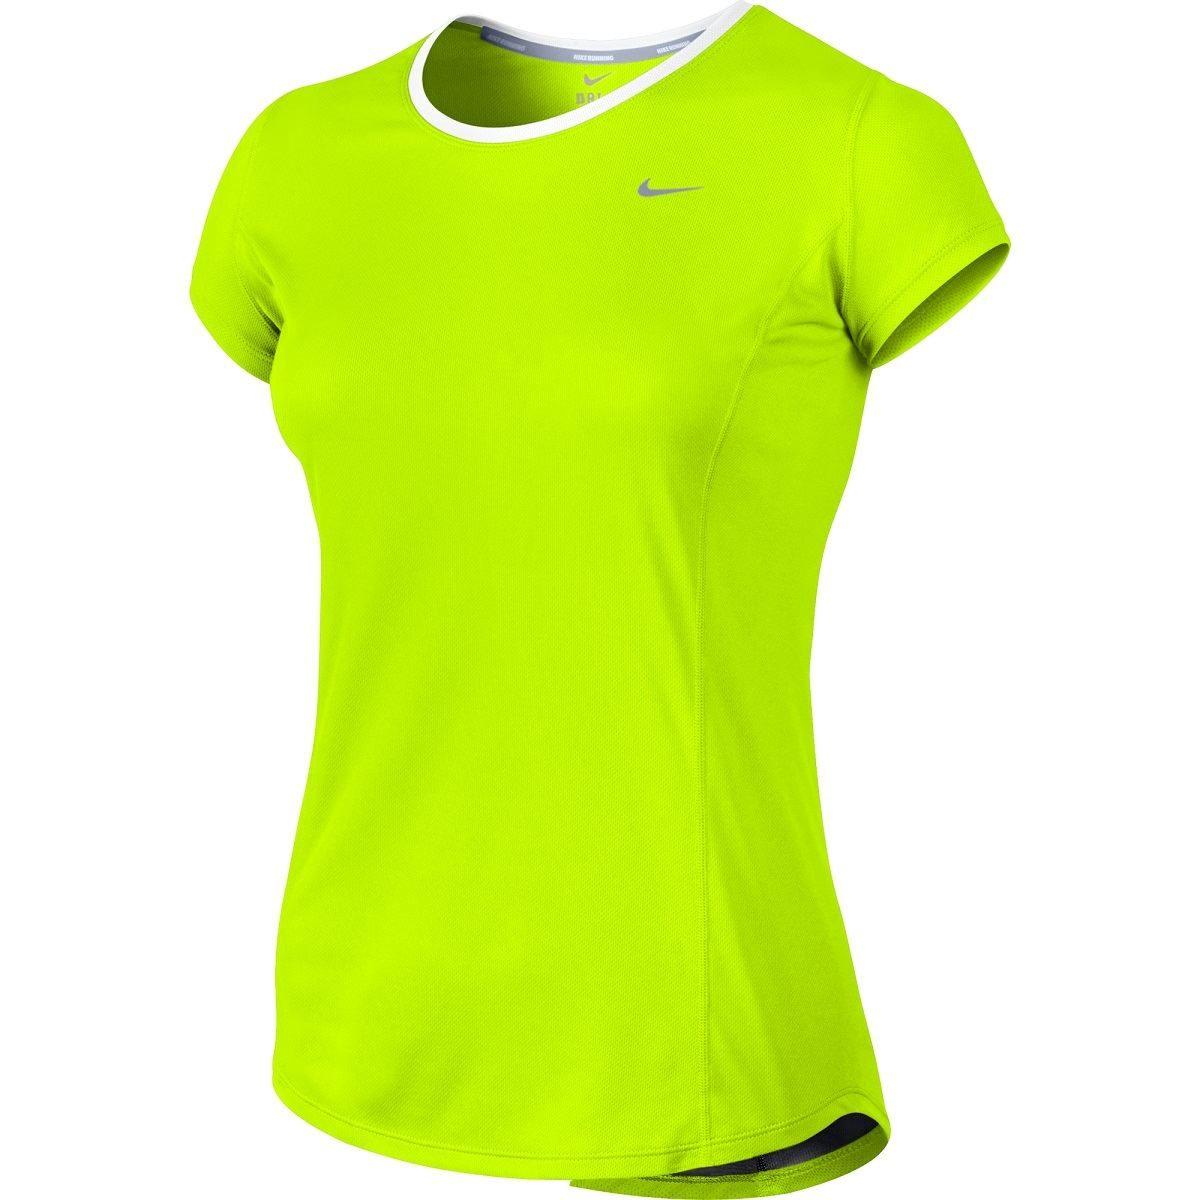 Nike Dry Miler T-Shirt Sportshirt Laufshirt Jogging Running Fitness Sport Herren